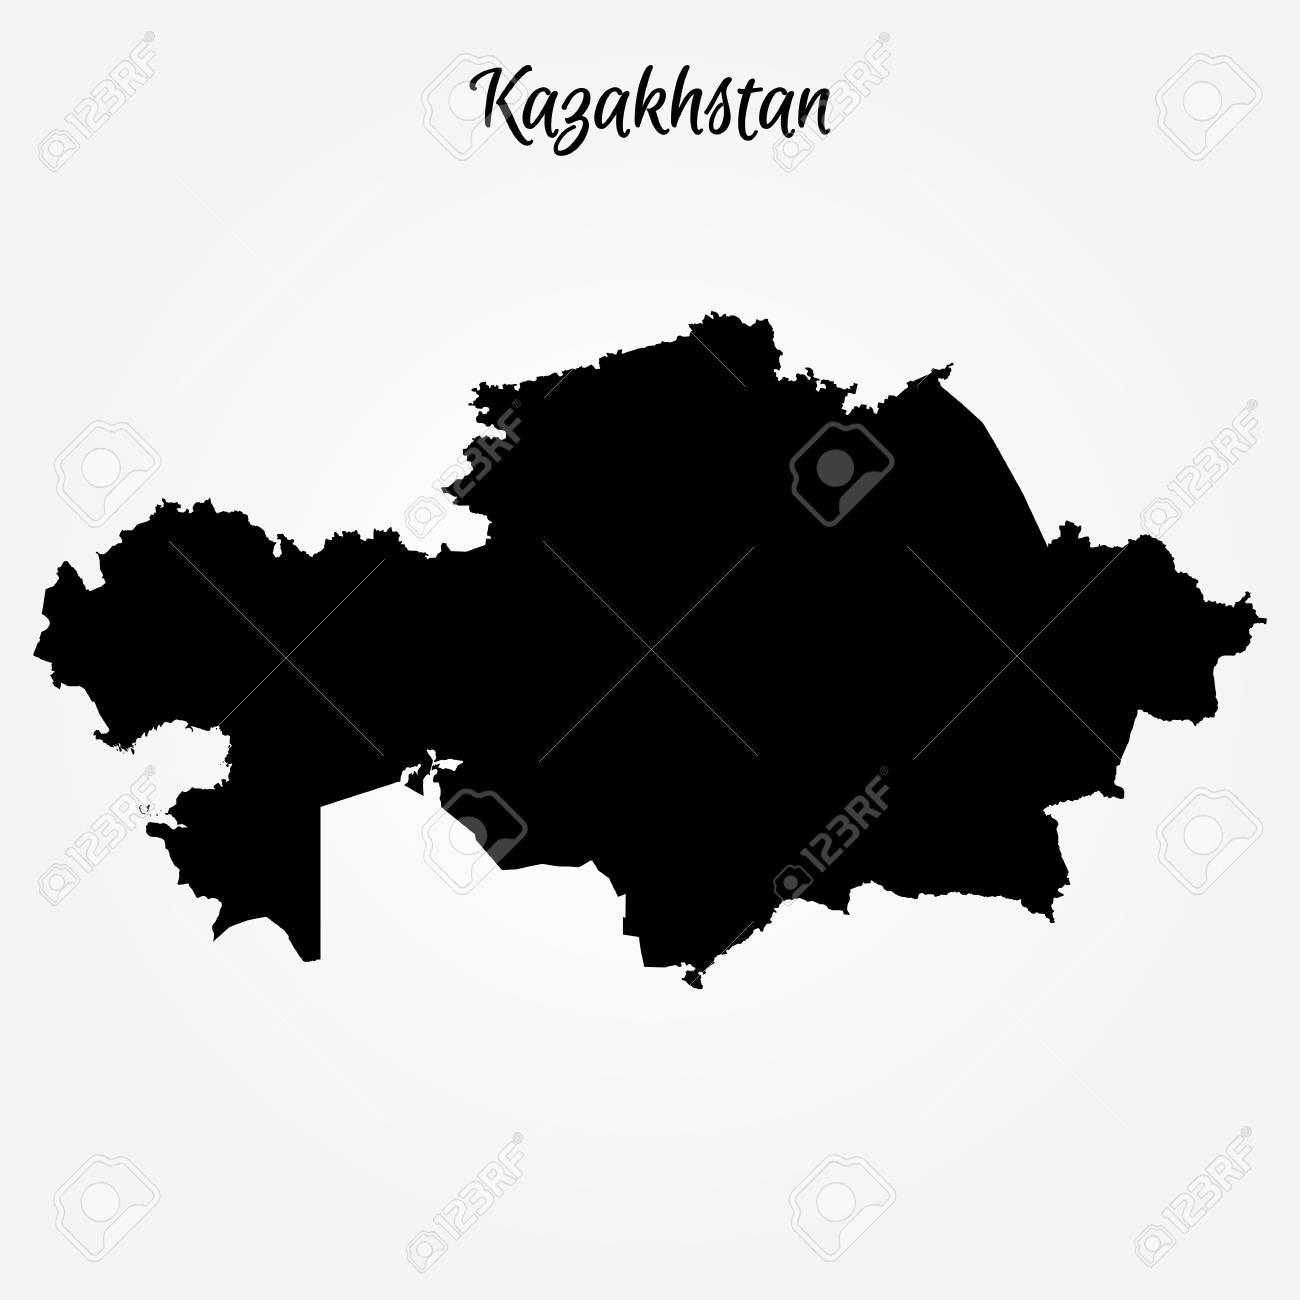 Map Of Kazakhstan Vector Illustration World Map Royalty Free